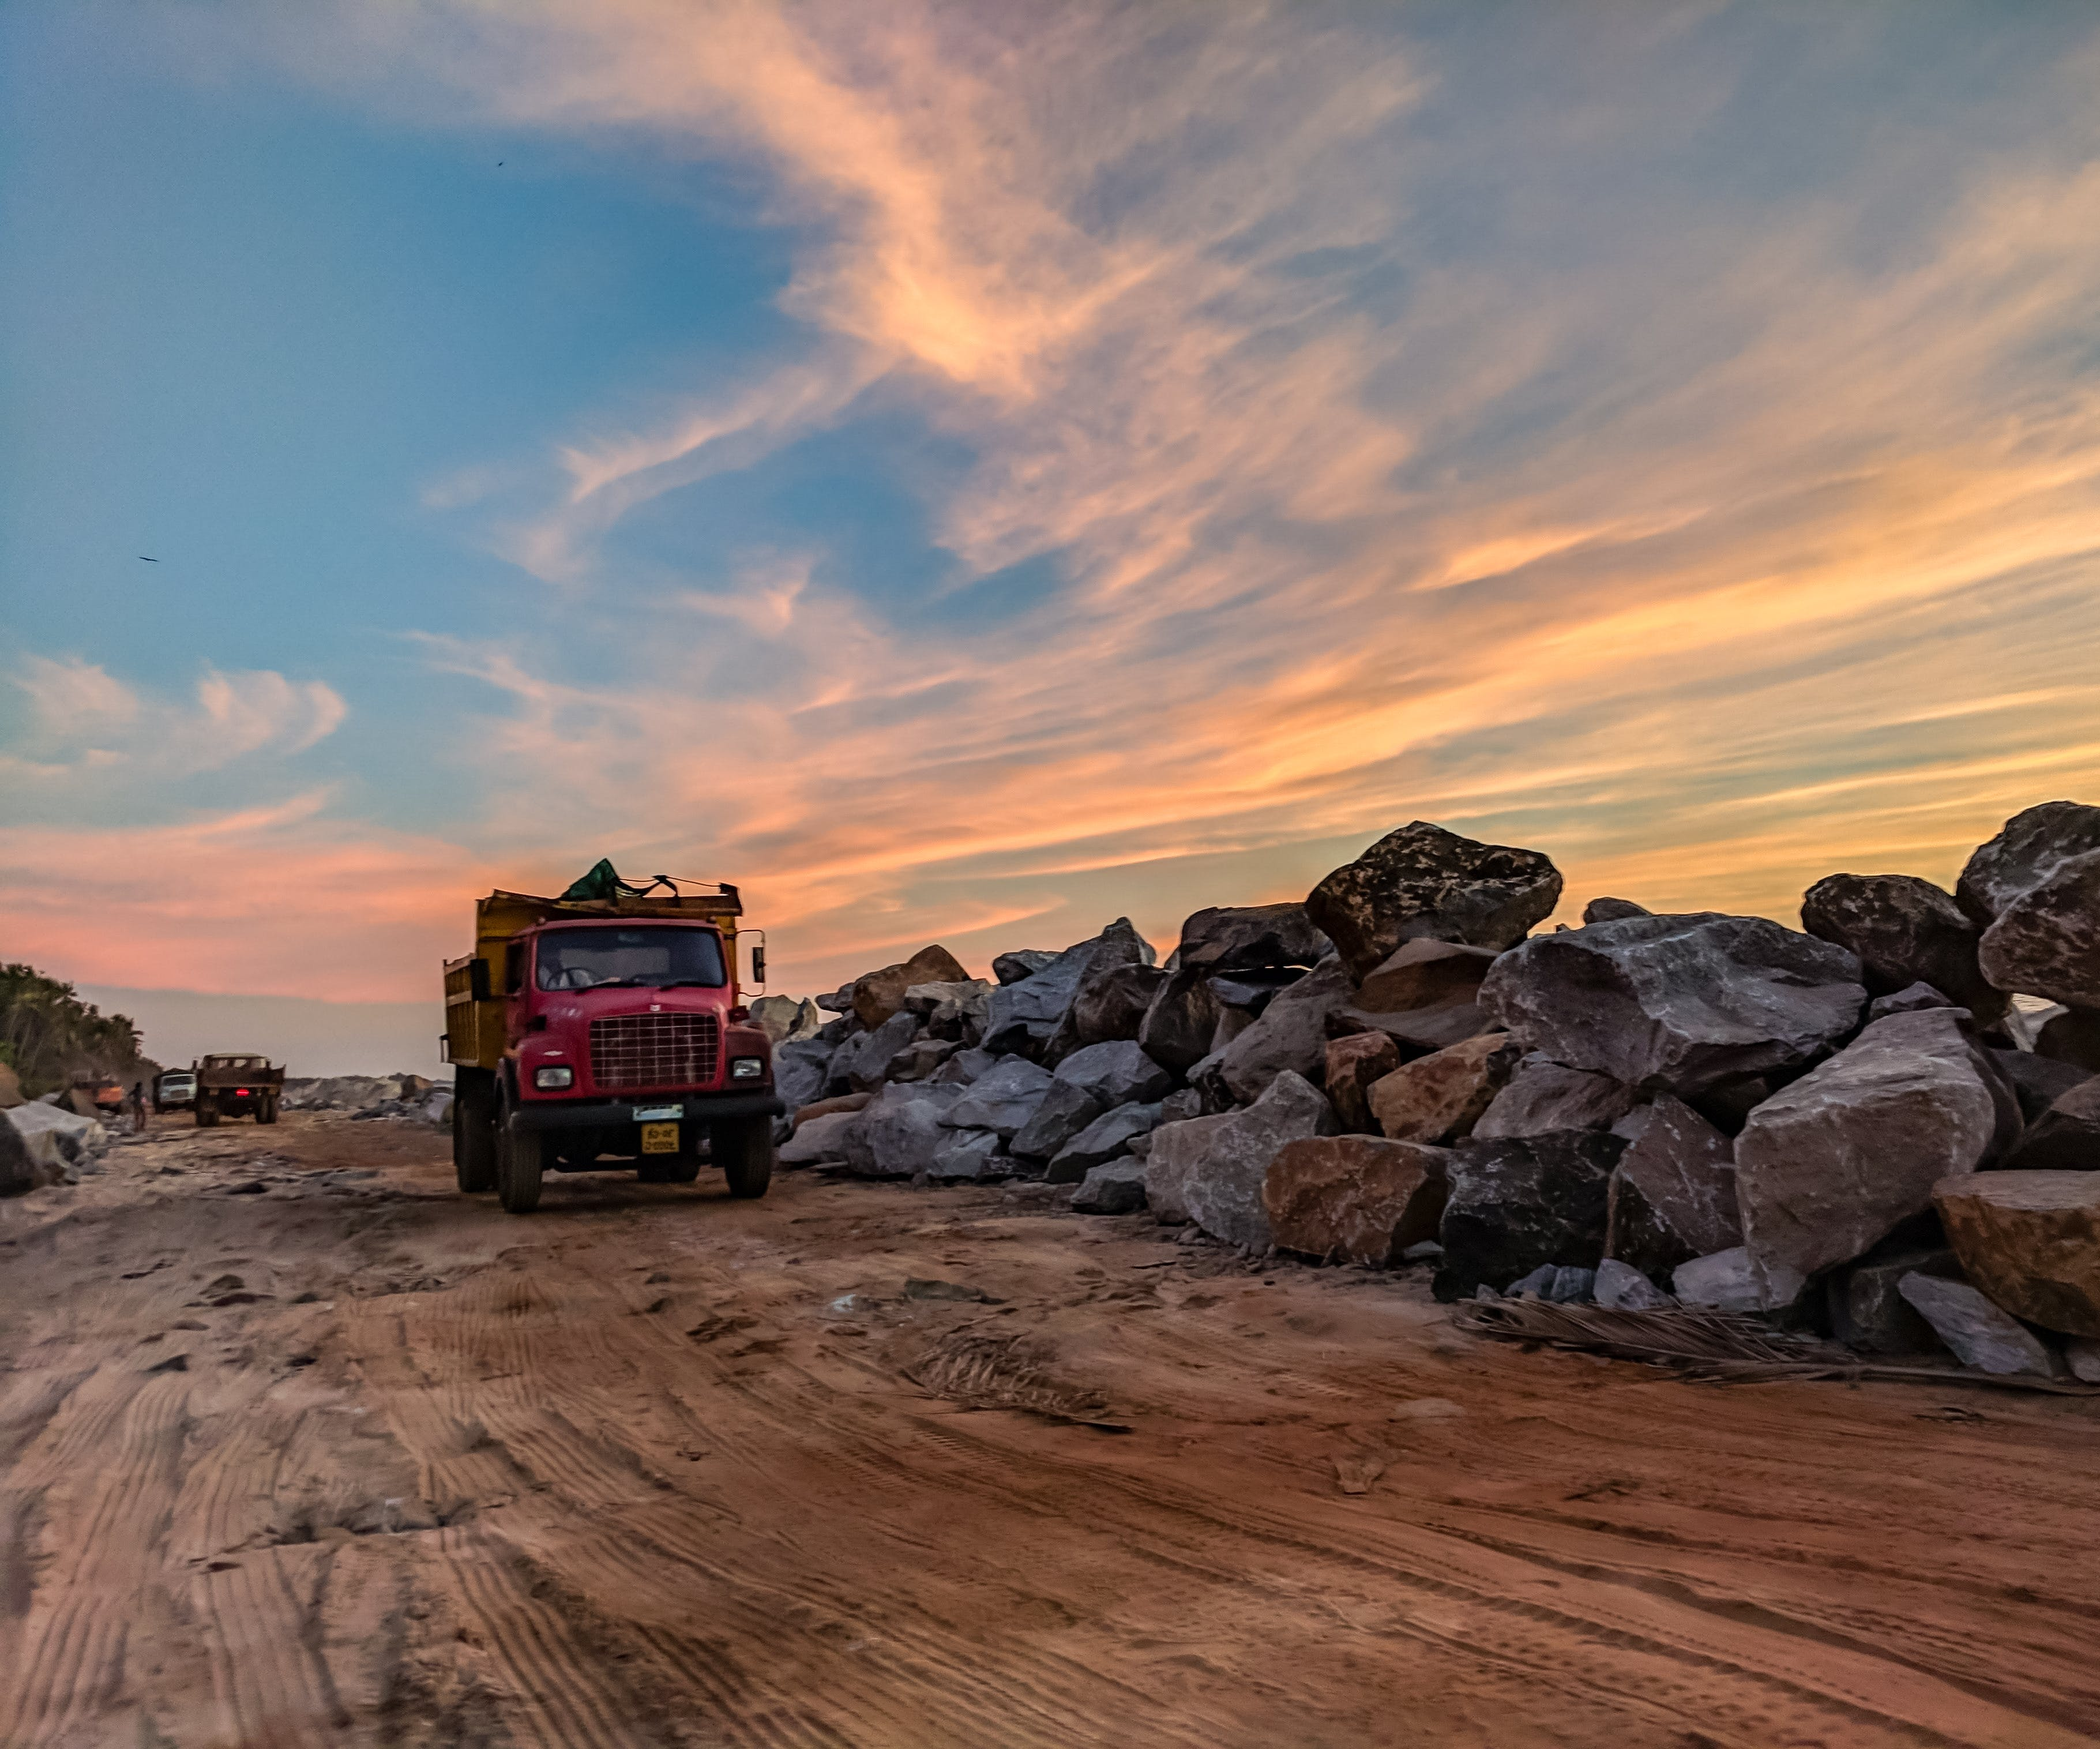 Red Dump Truck Near Filed Rocks Under Cloudy Sky